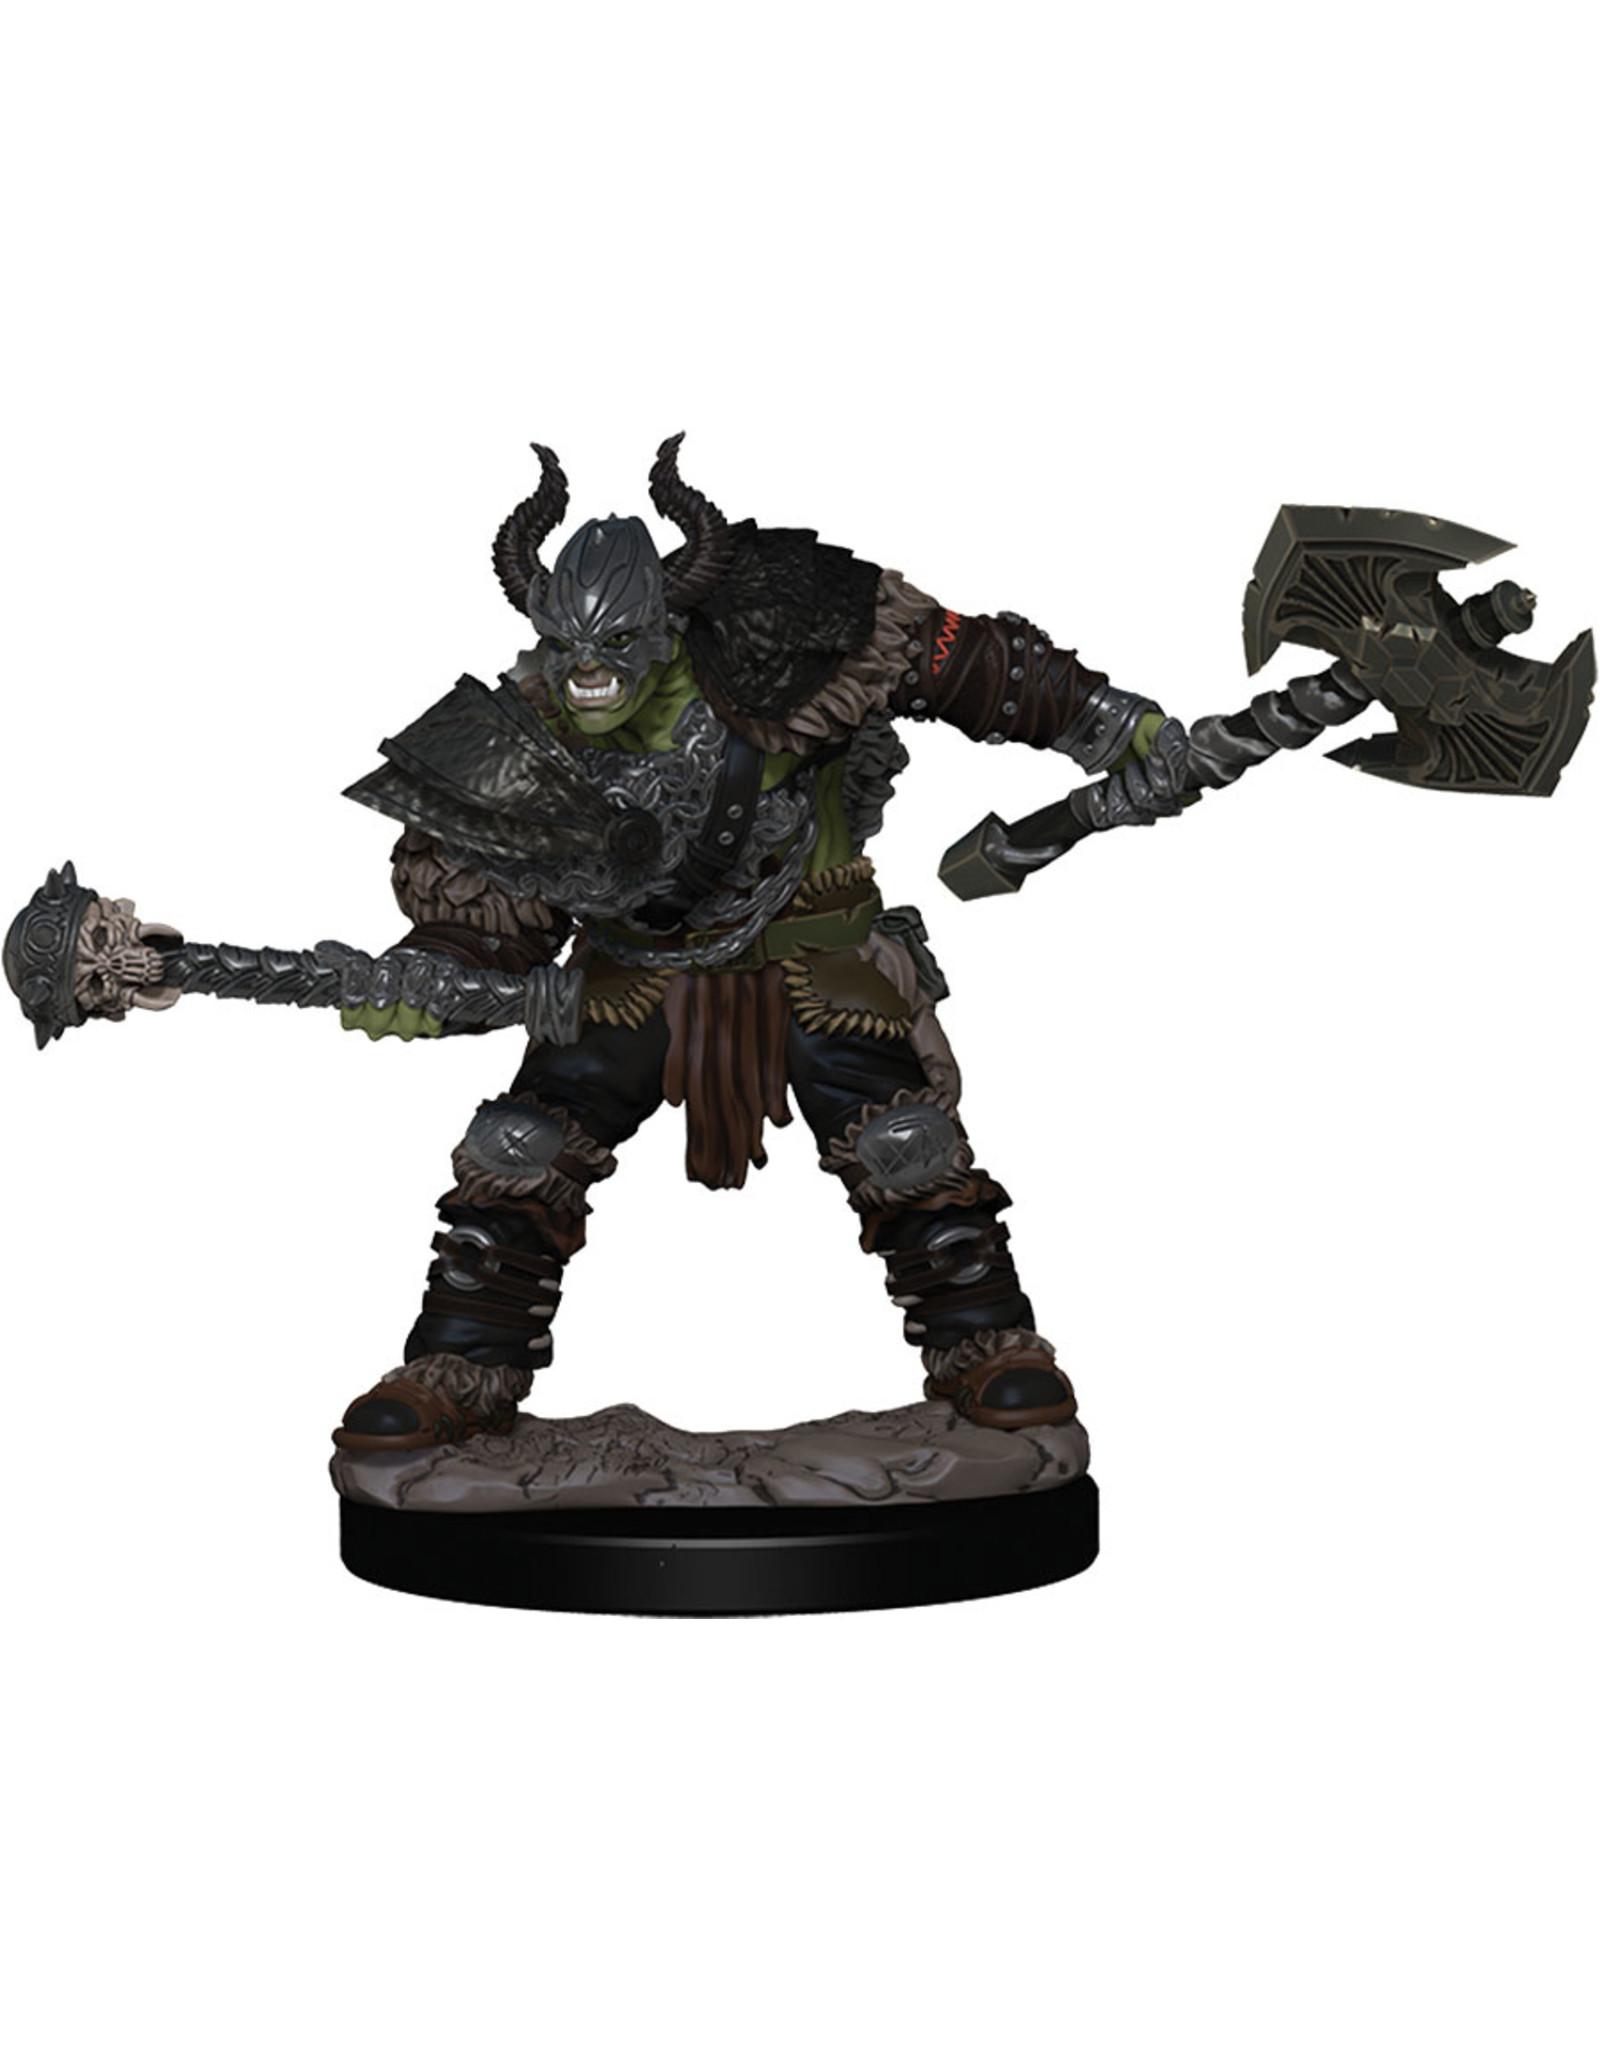 Wiz Kids PF Battles: Premium Painted Figure - W1 Half-Orc Barbarian Male